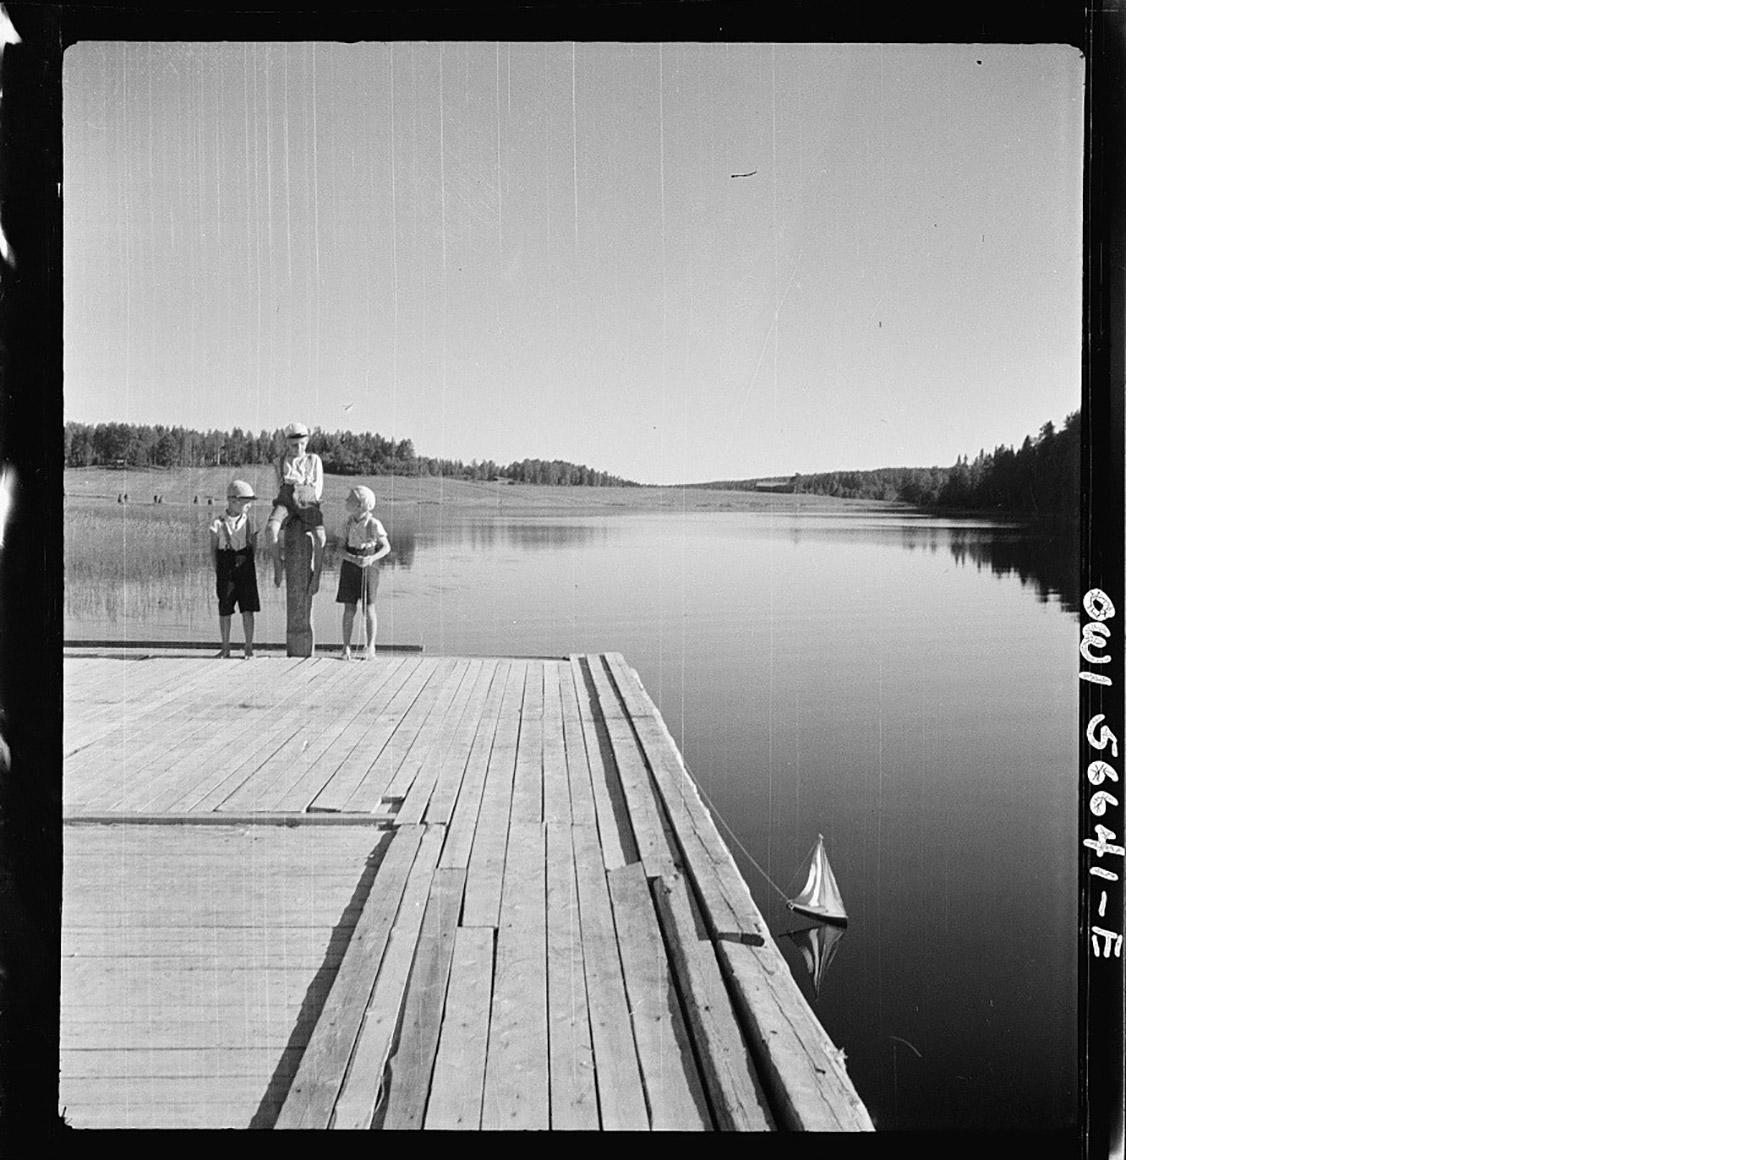 Foto Barbara Wright, ca 1941 / Collectie Library of Congress